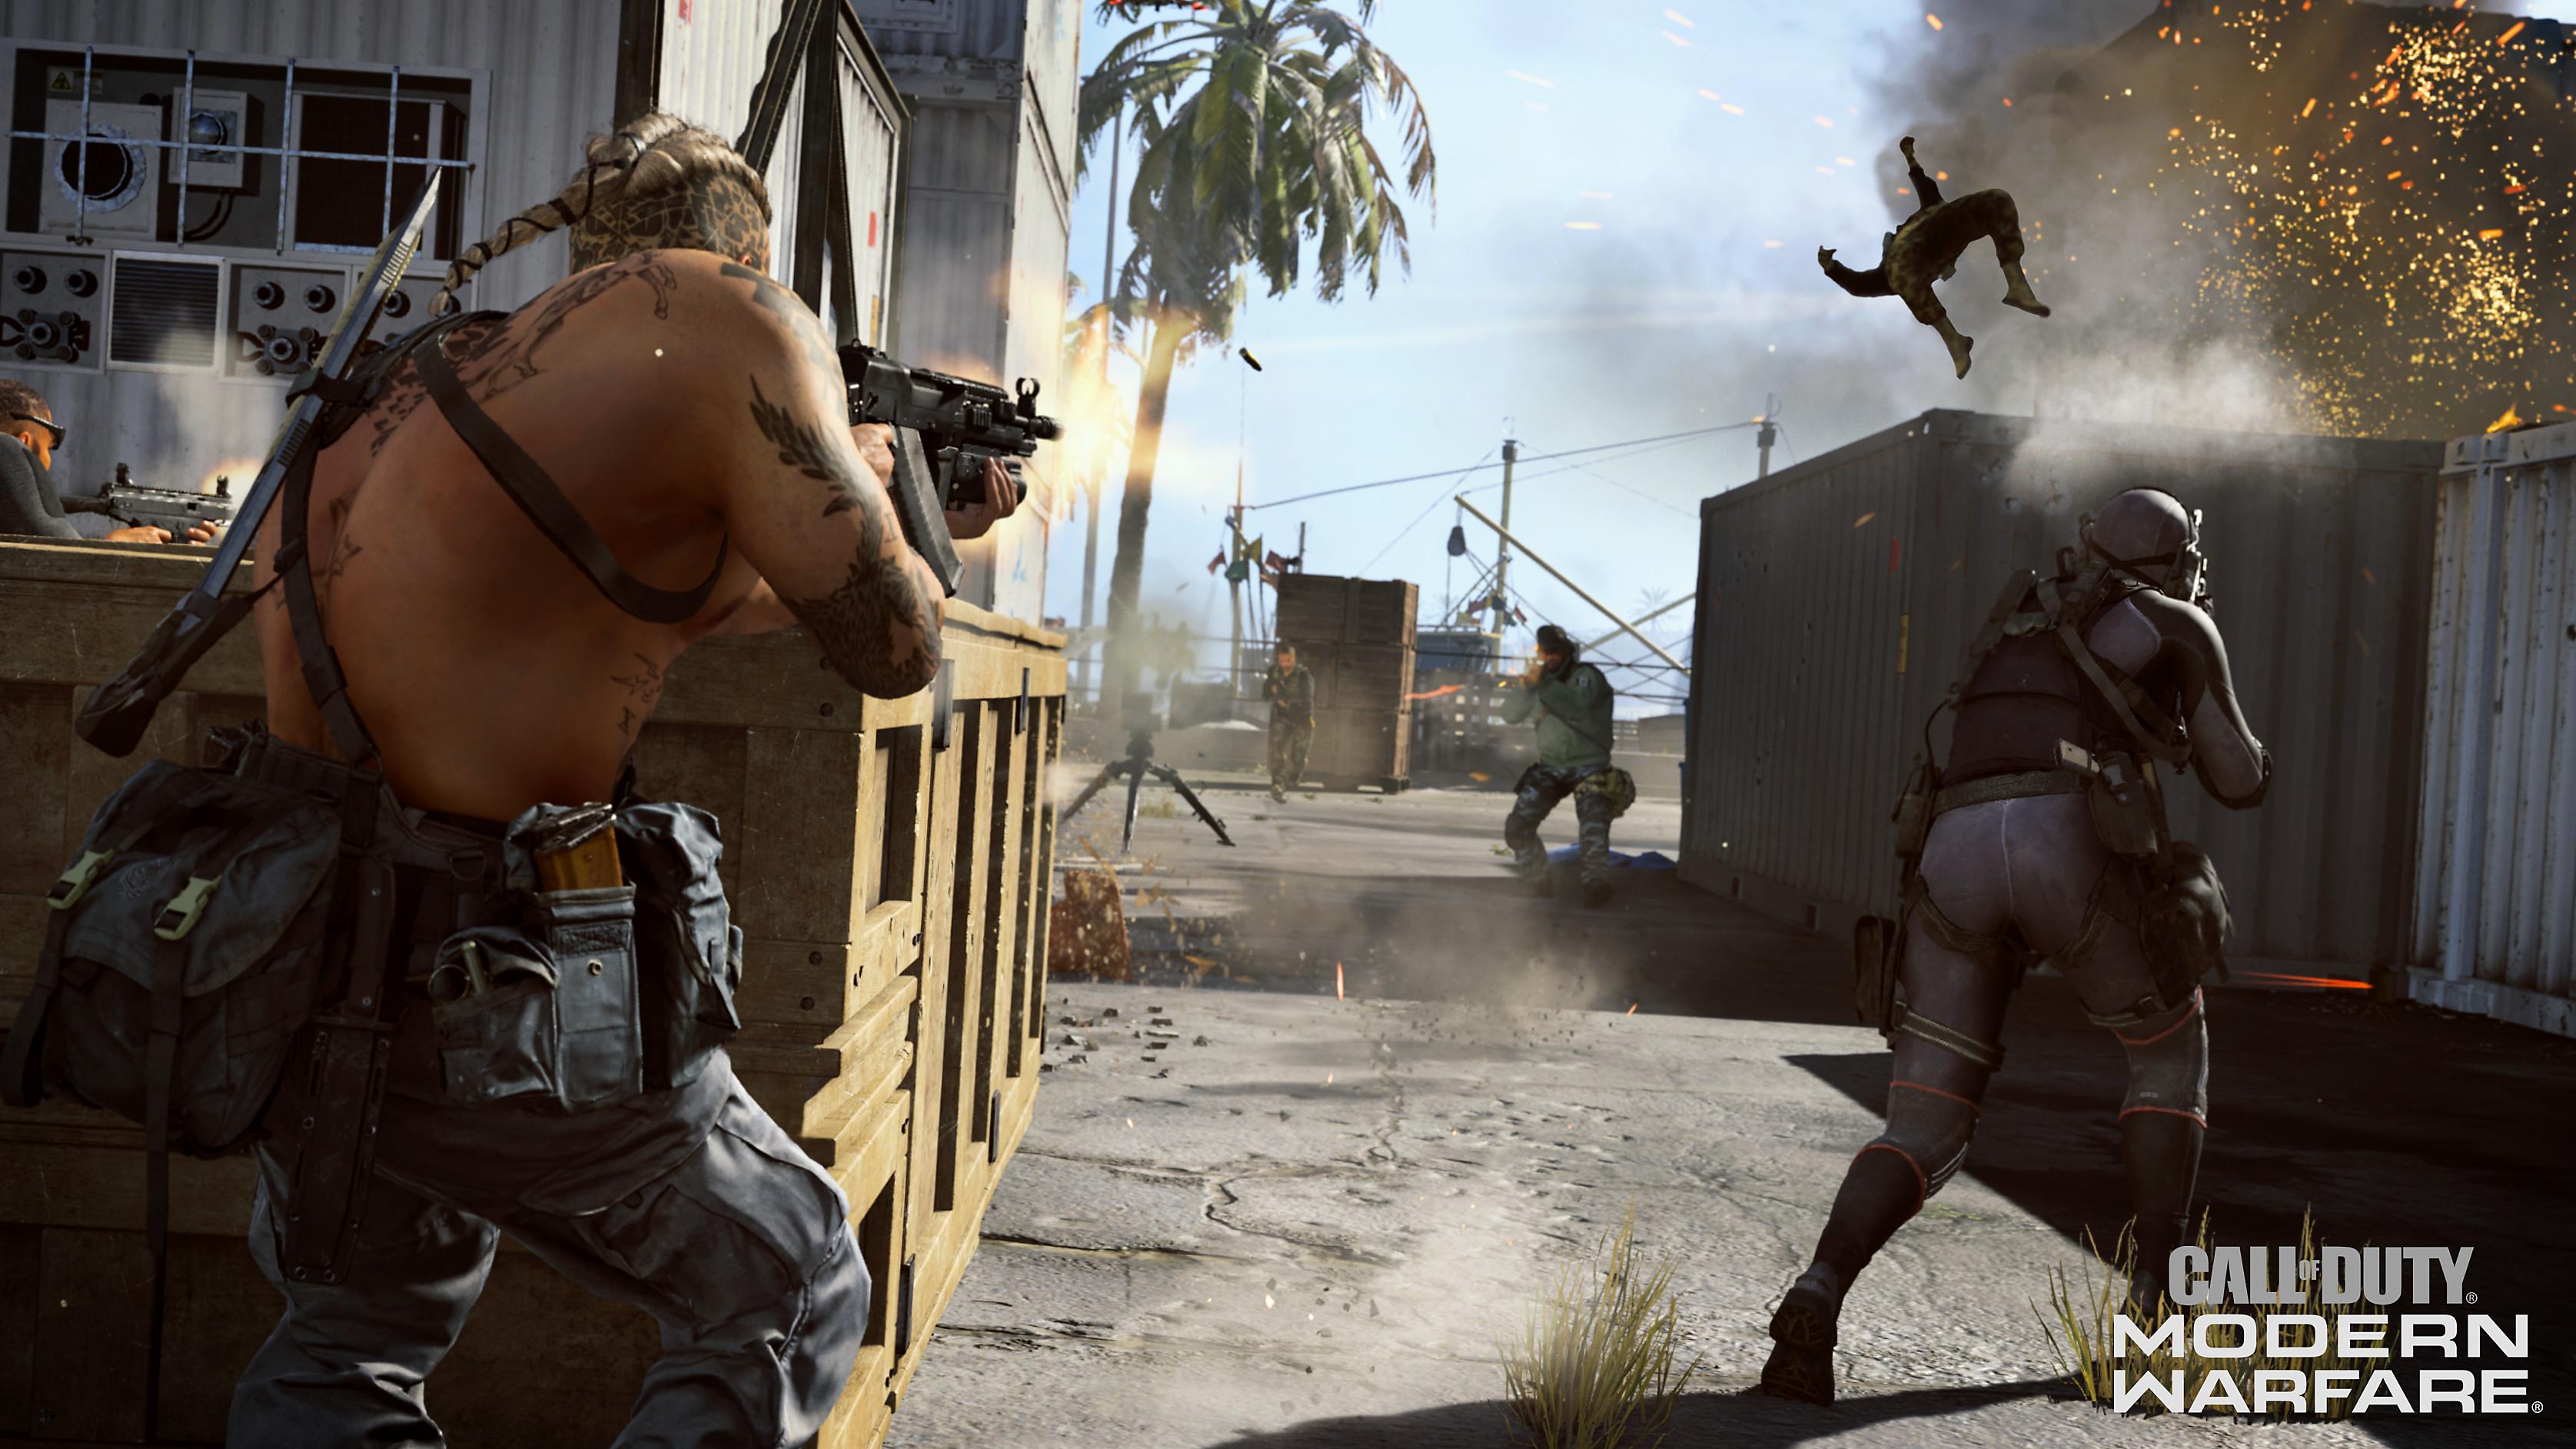 Call Of Duty Modern Warfare Game Ps4 Playstation